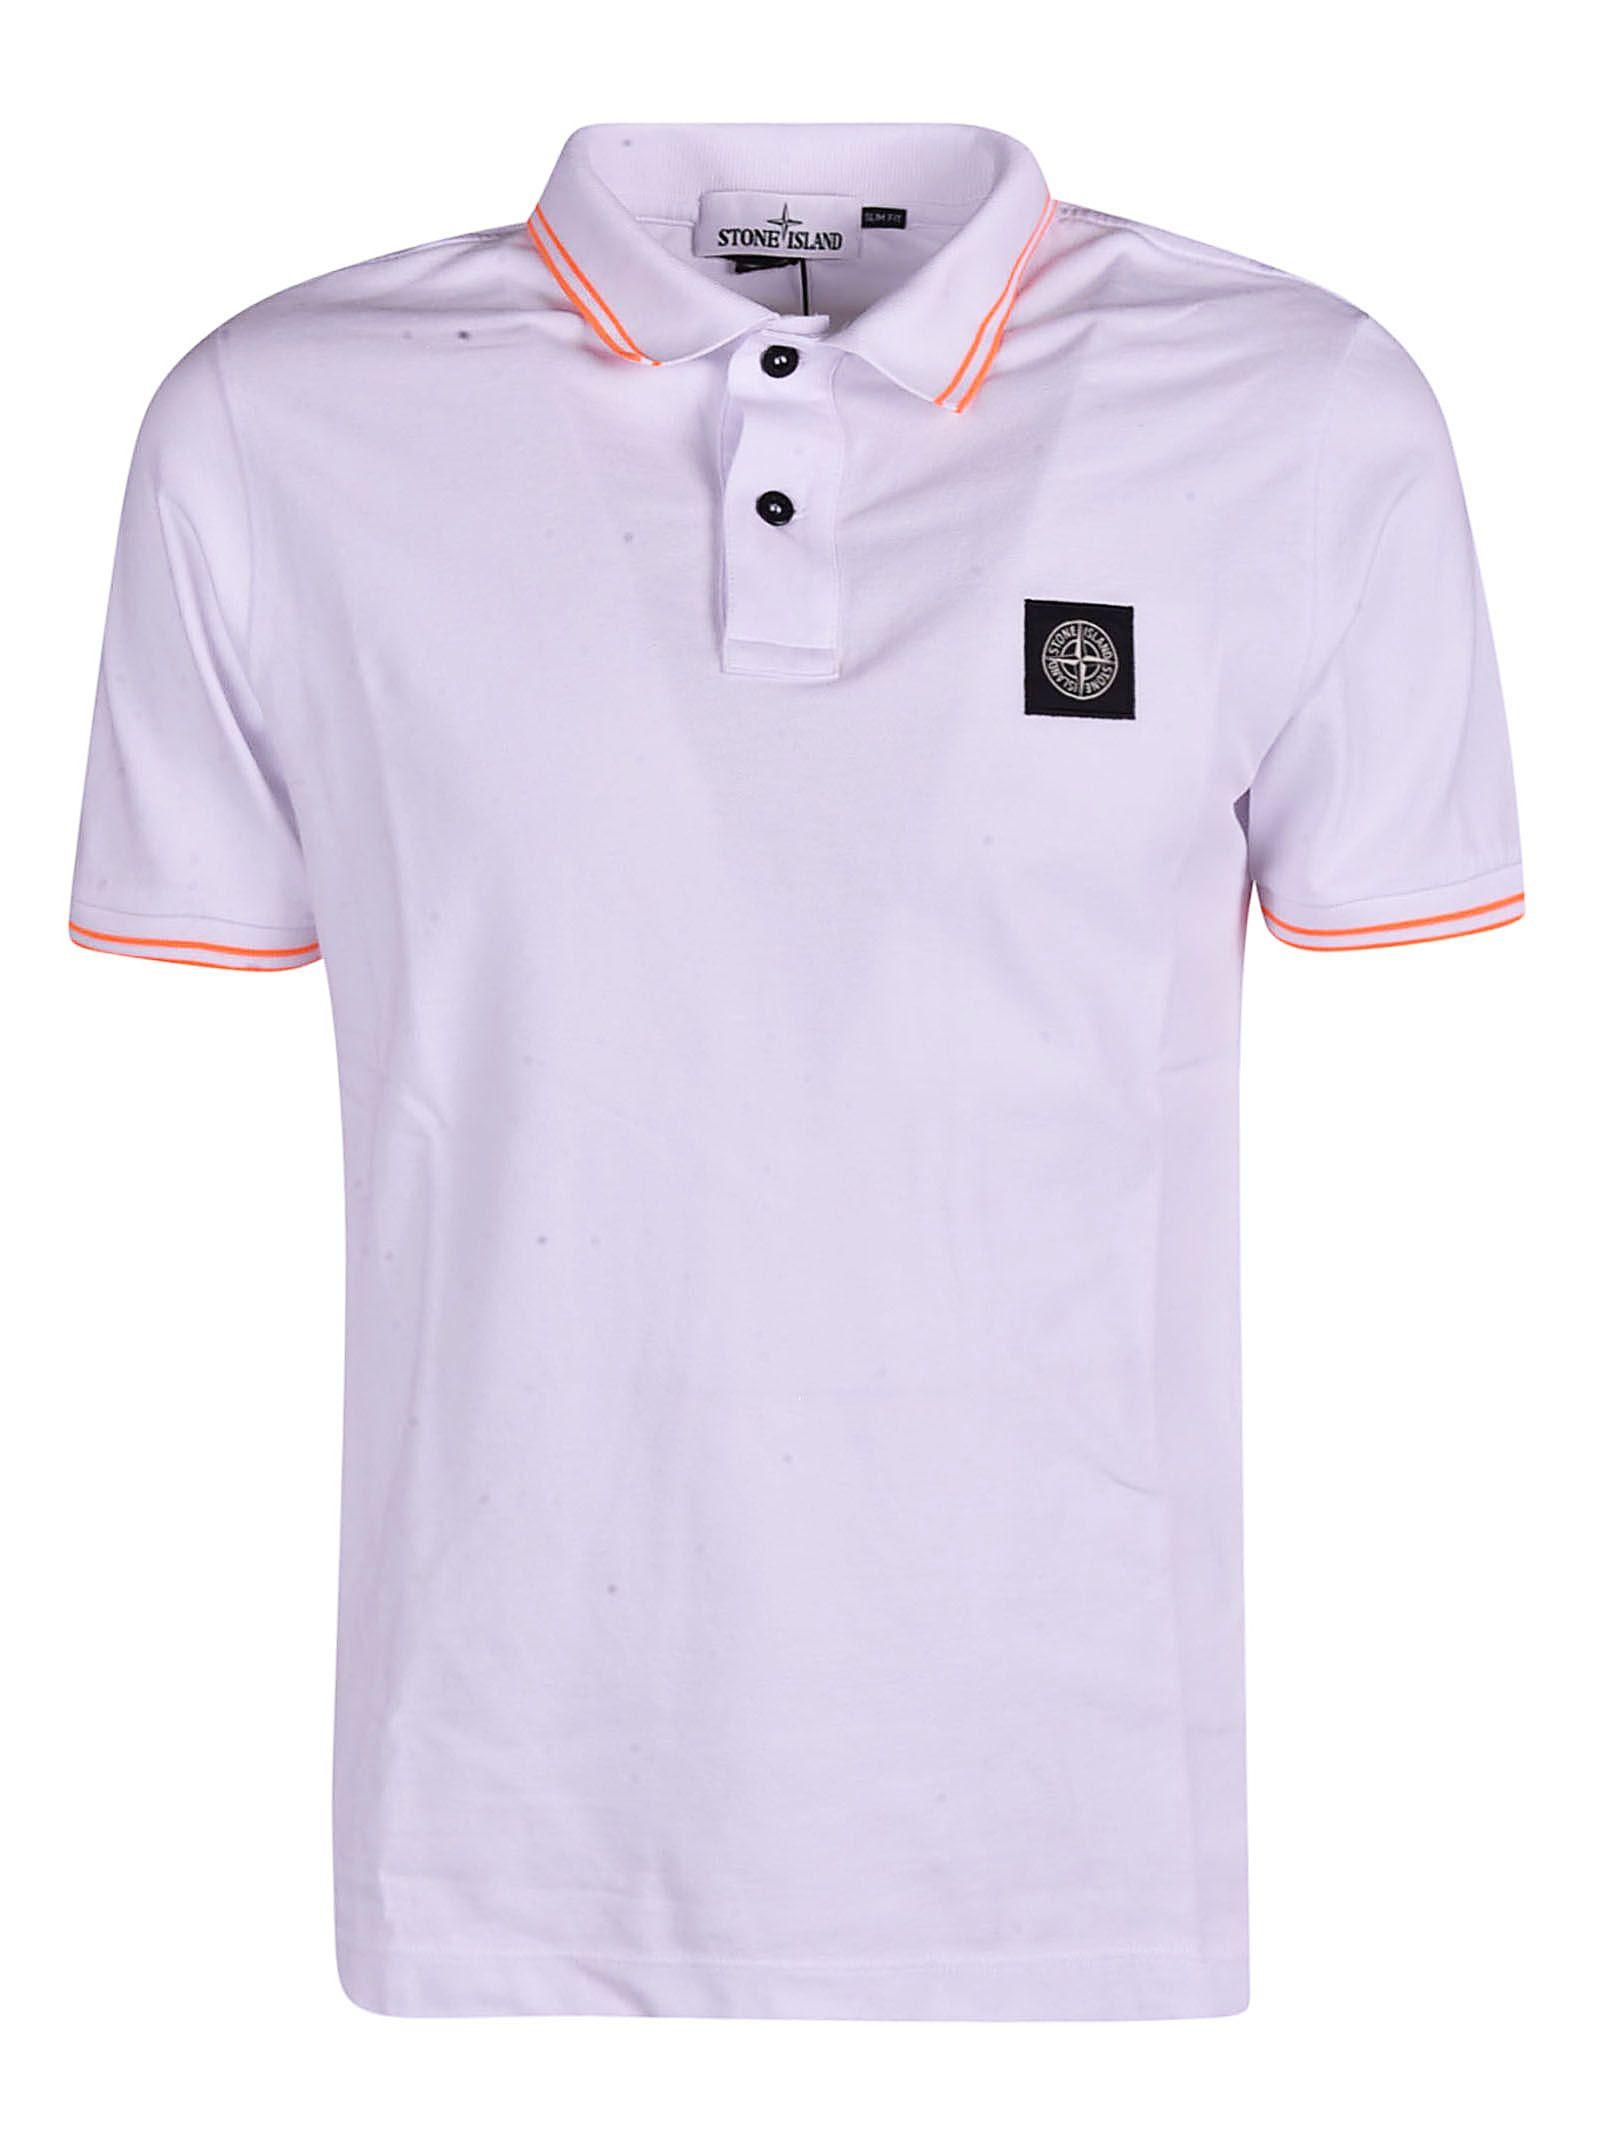 7786226d659 Stone Island Stone Island Logo Polo Shirt - Bianco - 10858658 | italist